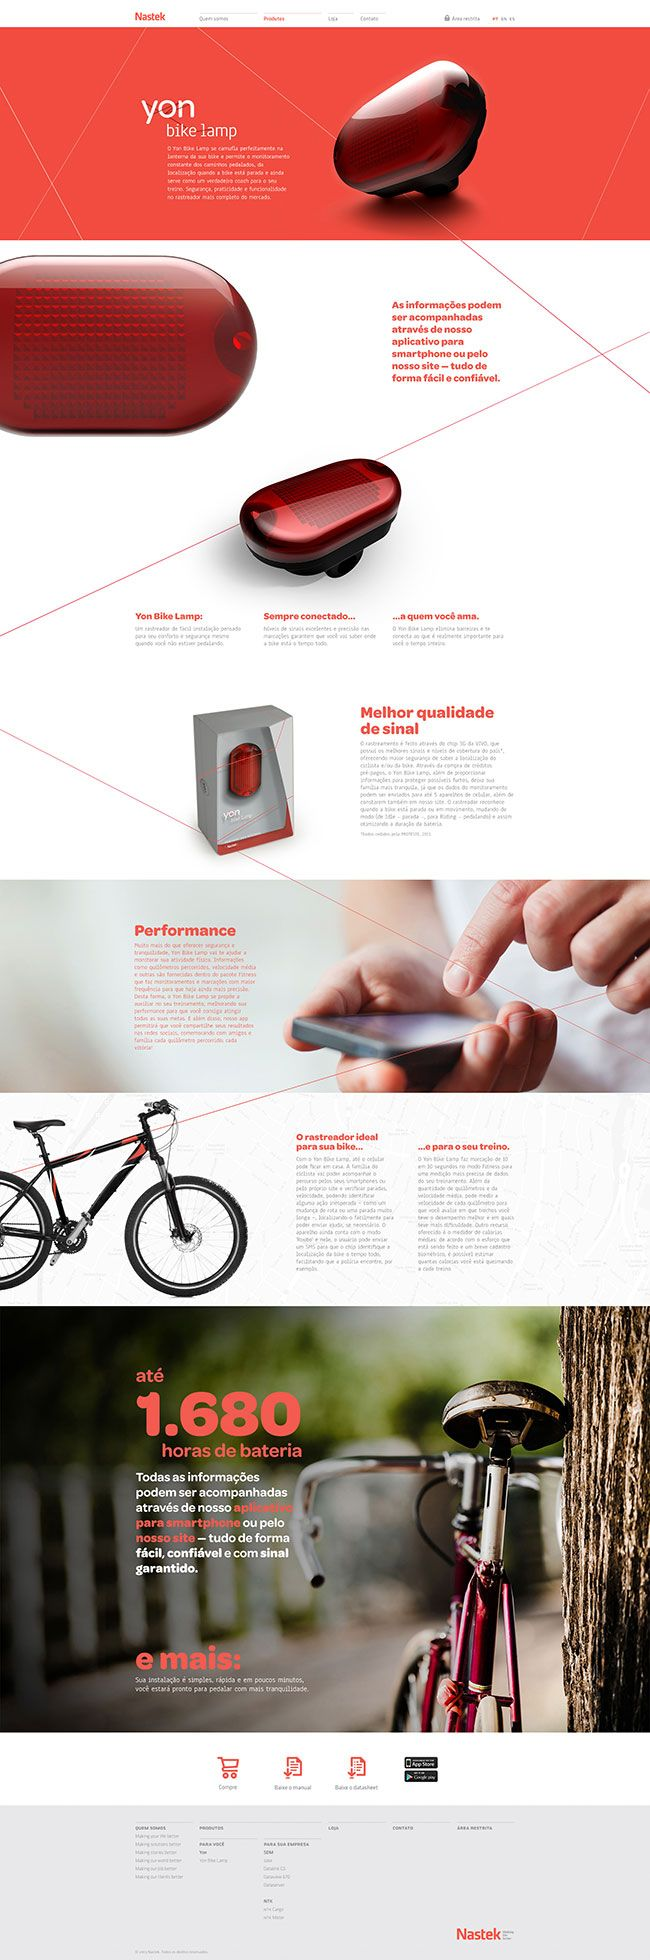 Yon - WebPage   Design: UI/UX. Apps. Websites   identitydesigned  